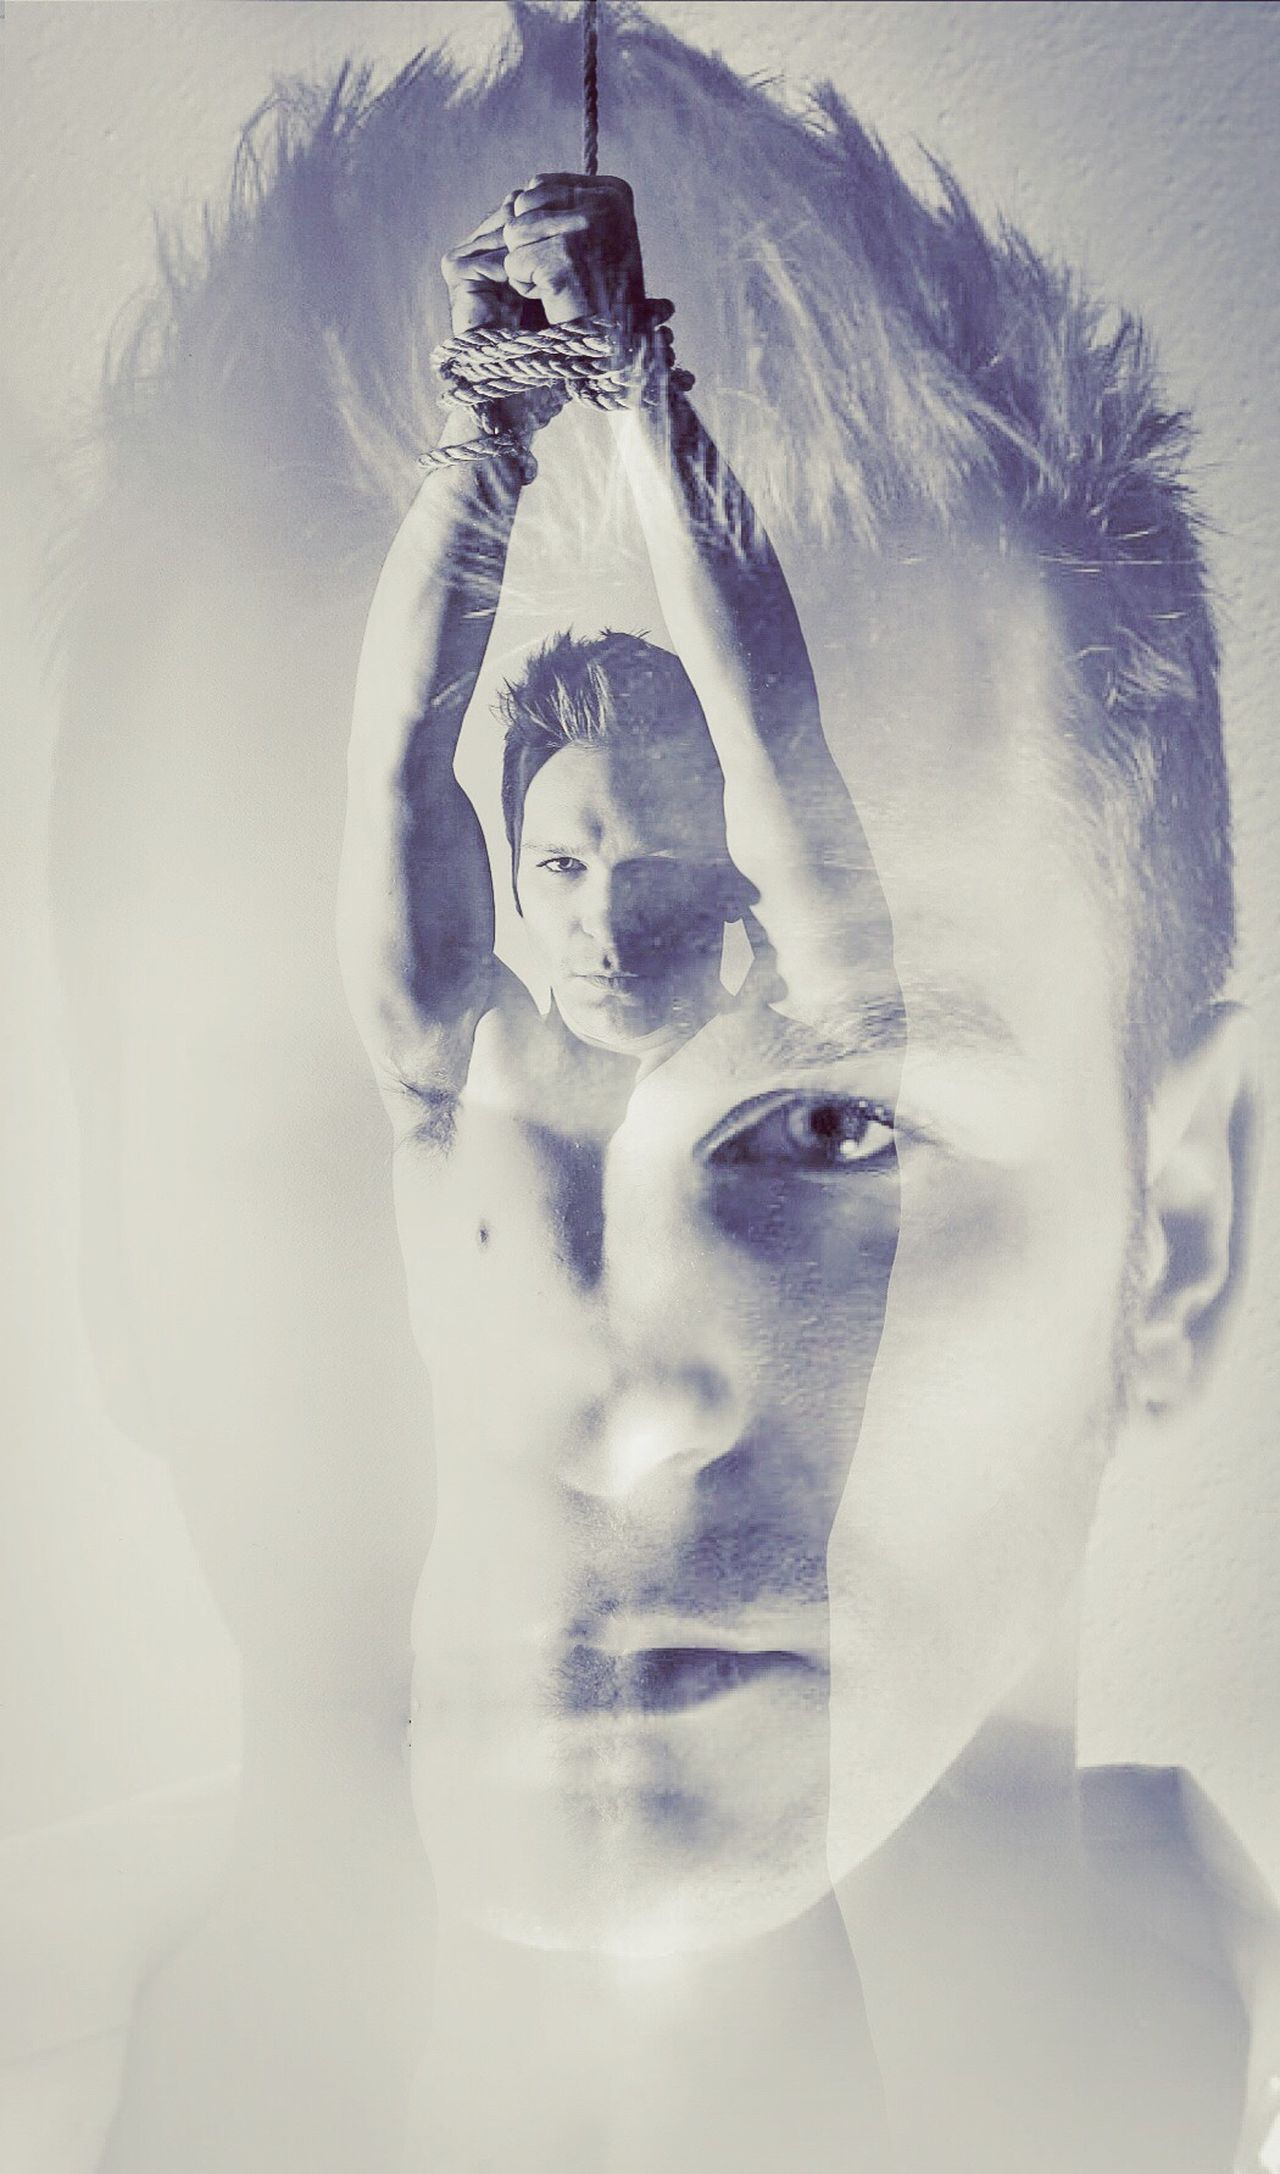 Portrait Headshot Double Exposure Real People Modeling Art Eyes Tied Prisoner Of Dreams... Beautiful People Photoshoot Photo Art